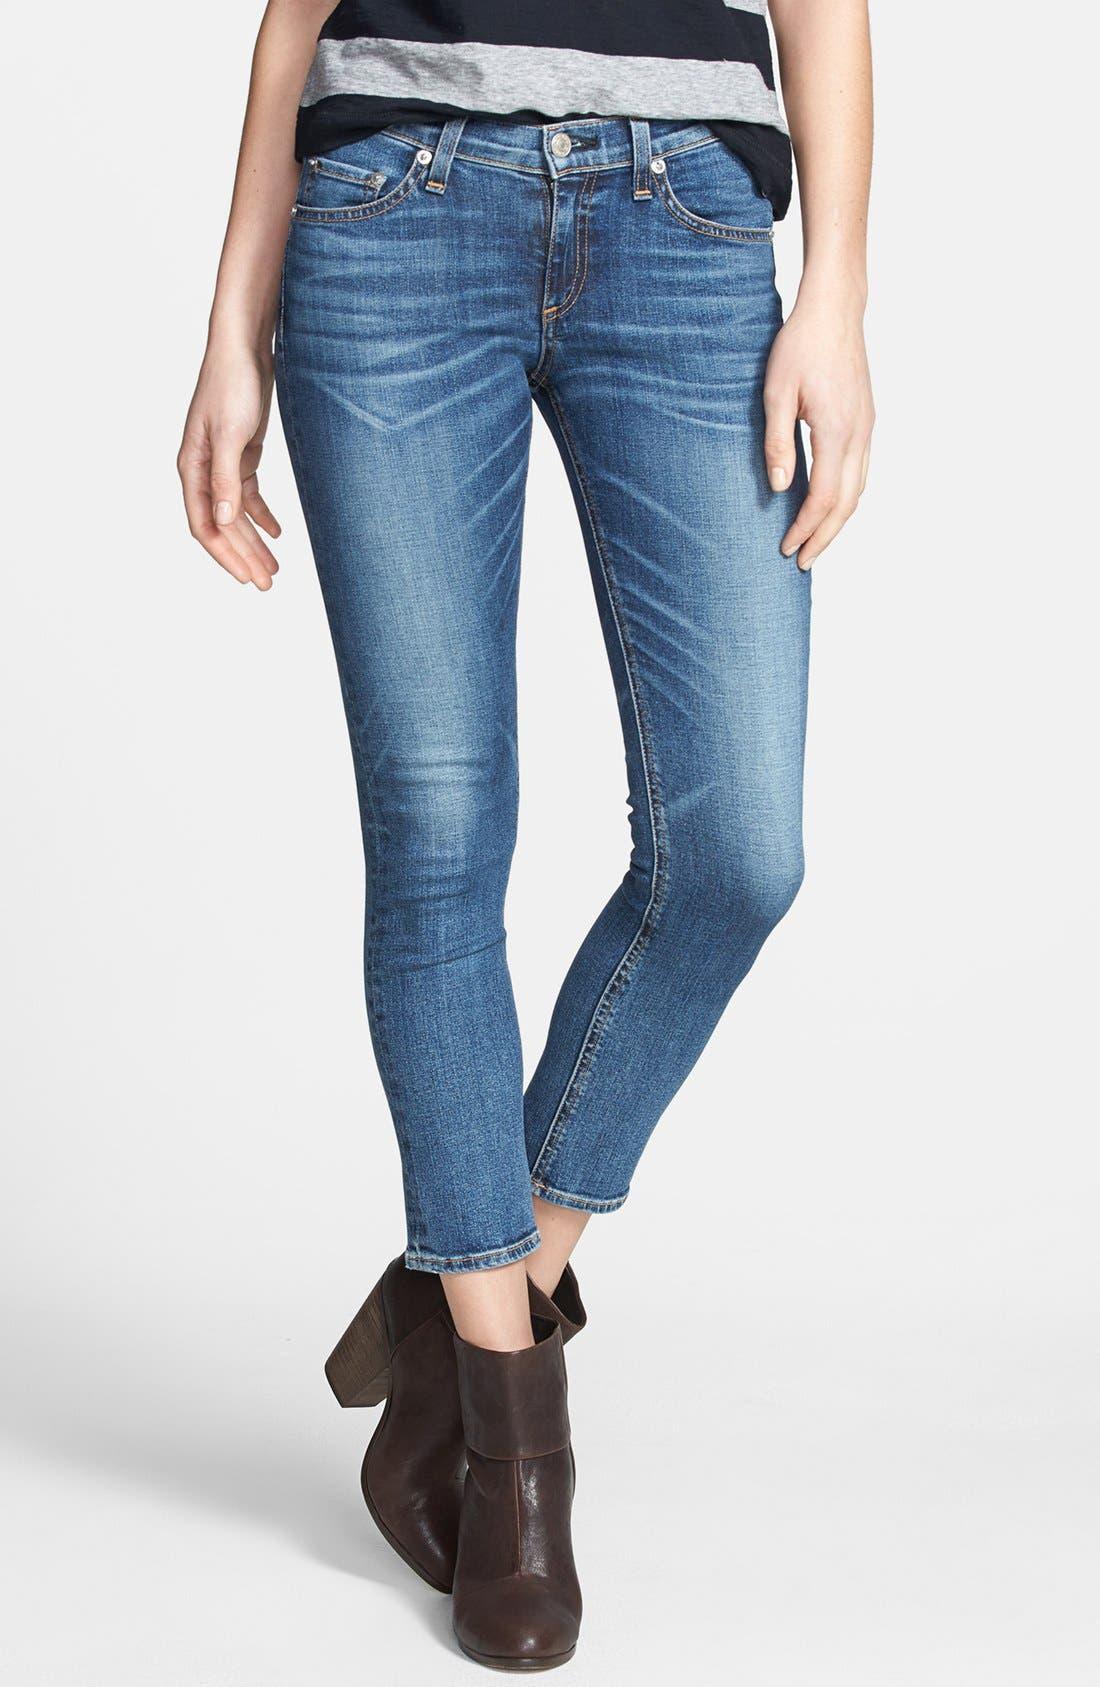 Alternate Image 1 Selected - rag & bone/JEAN Crop Skinny Jeans (Sonoma)